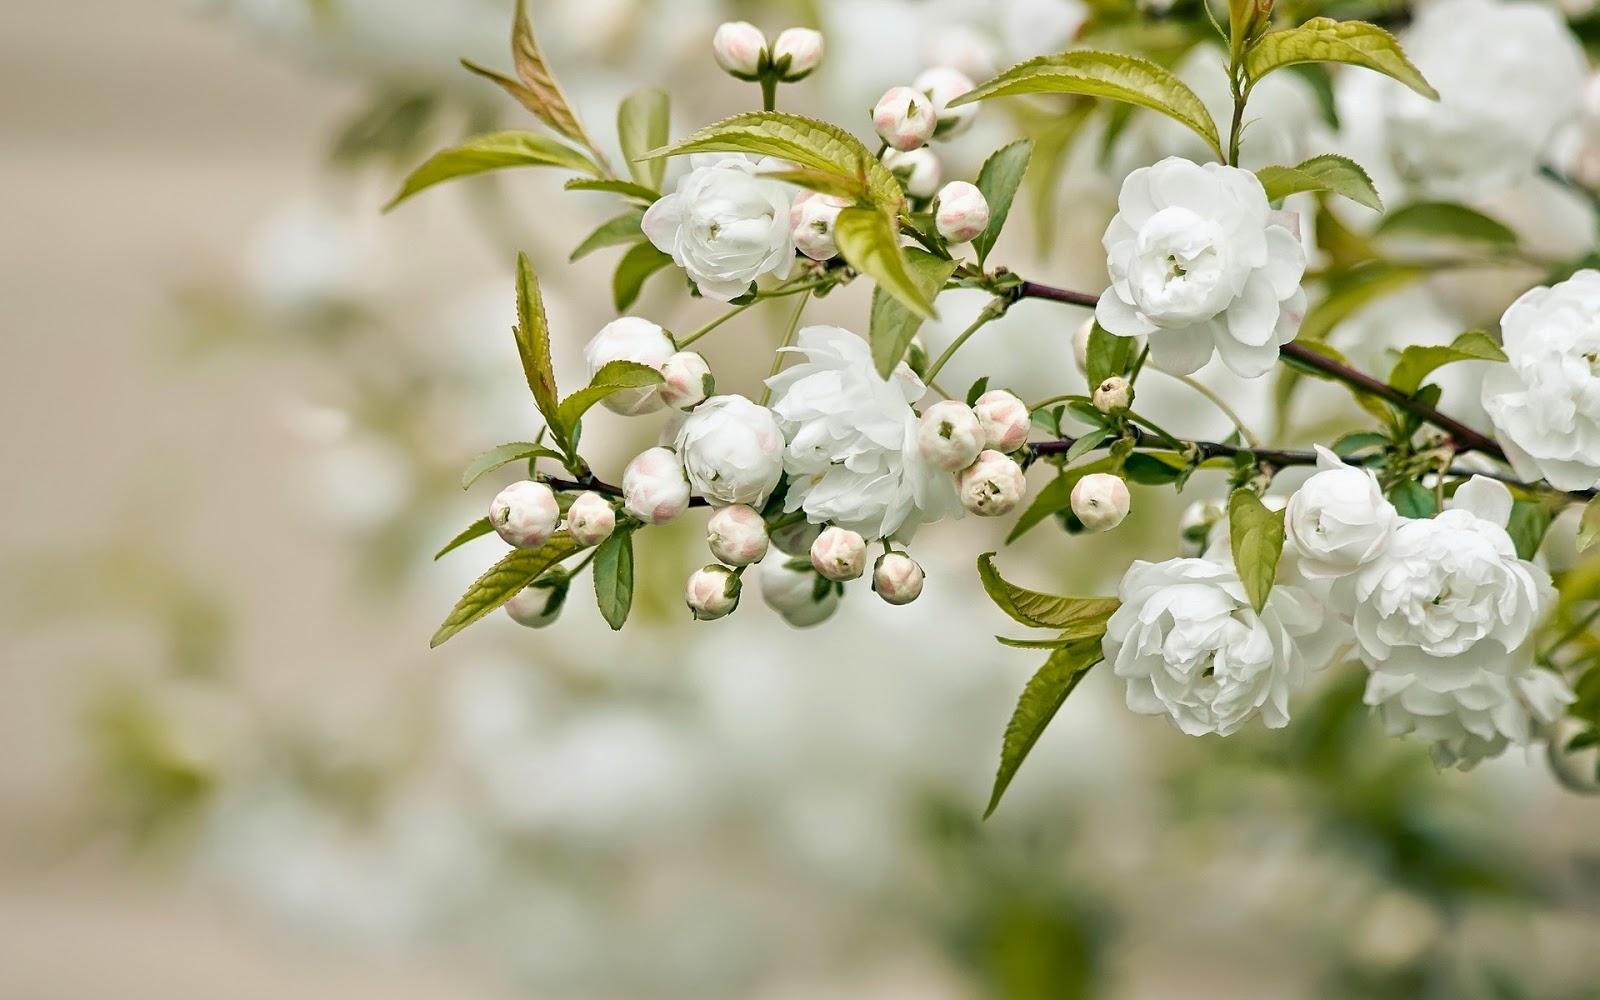 Imagenes de Amor, Flores Blancas, parte 7